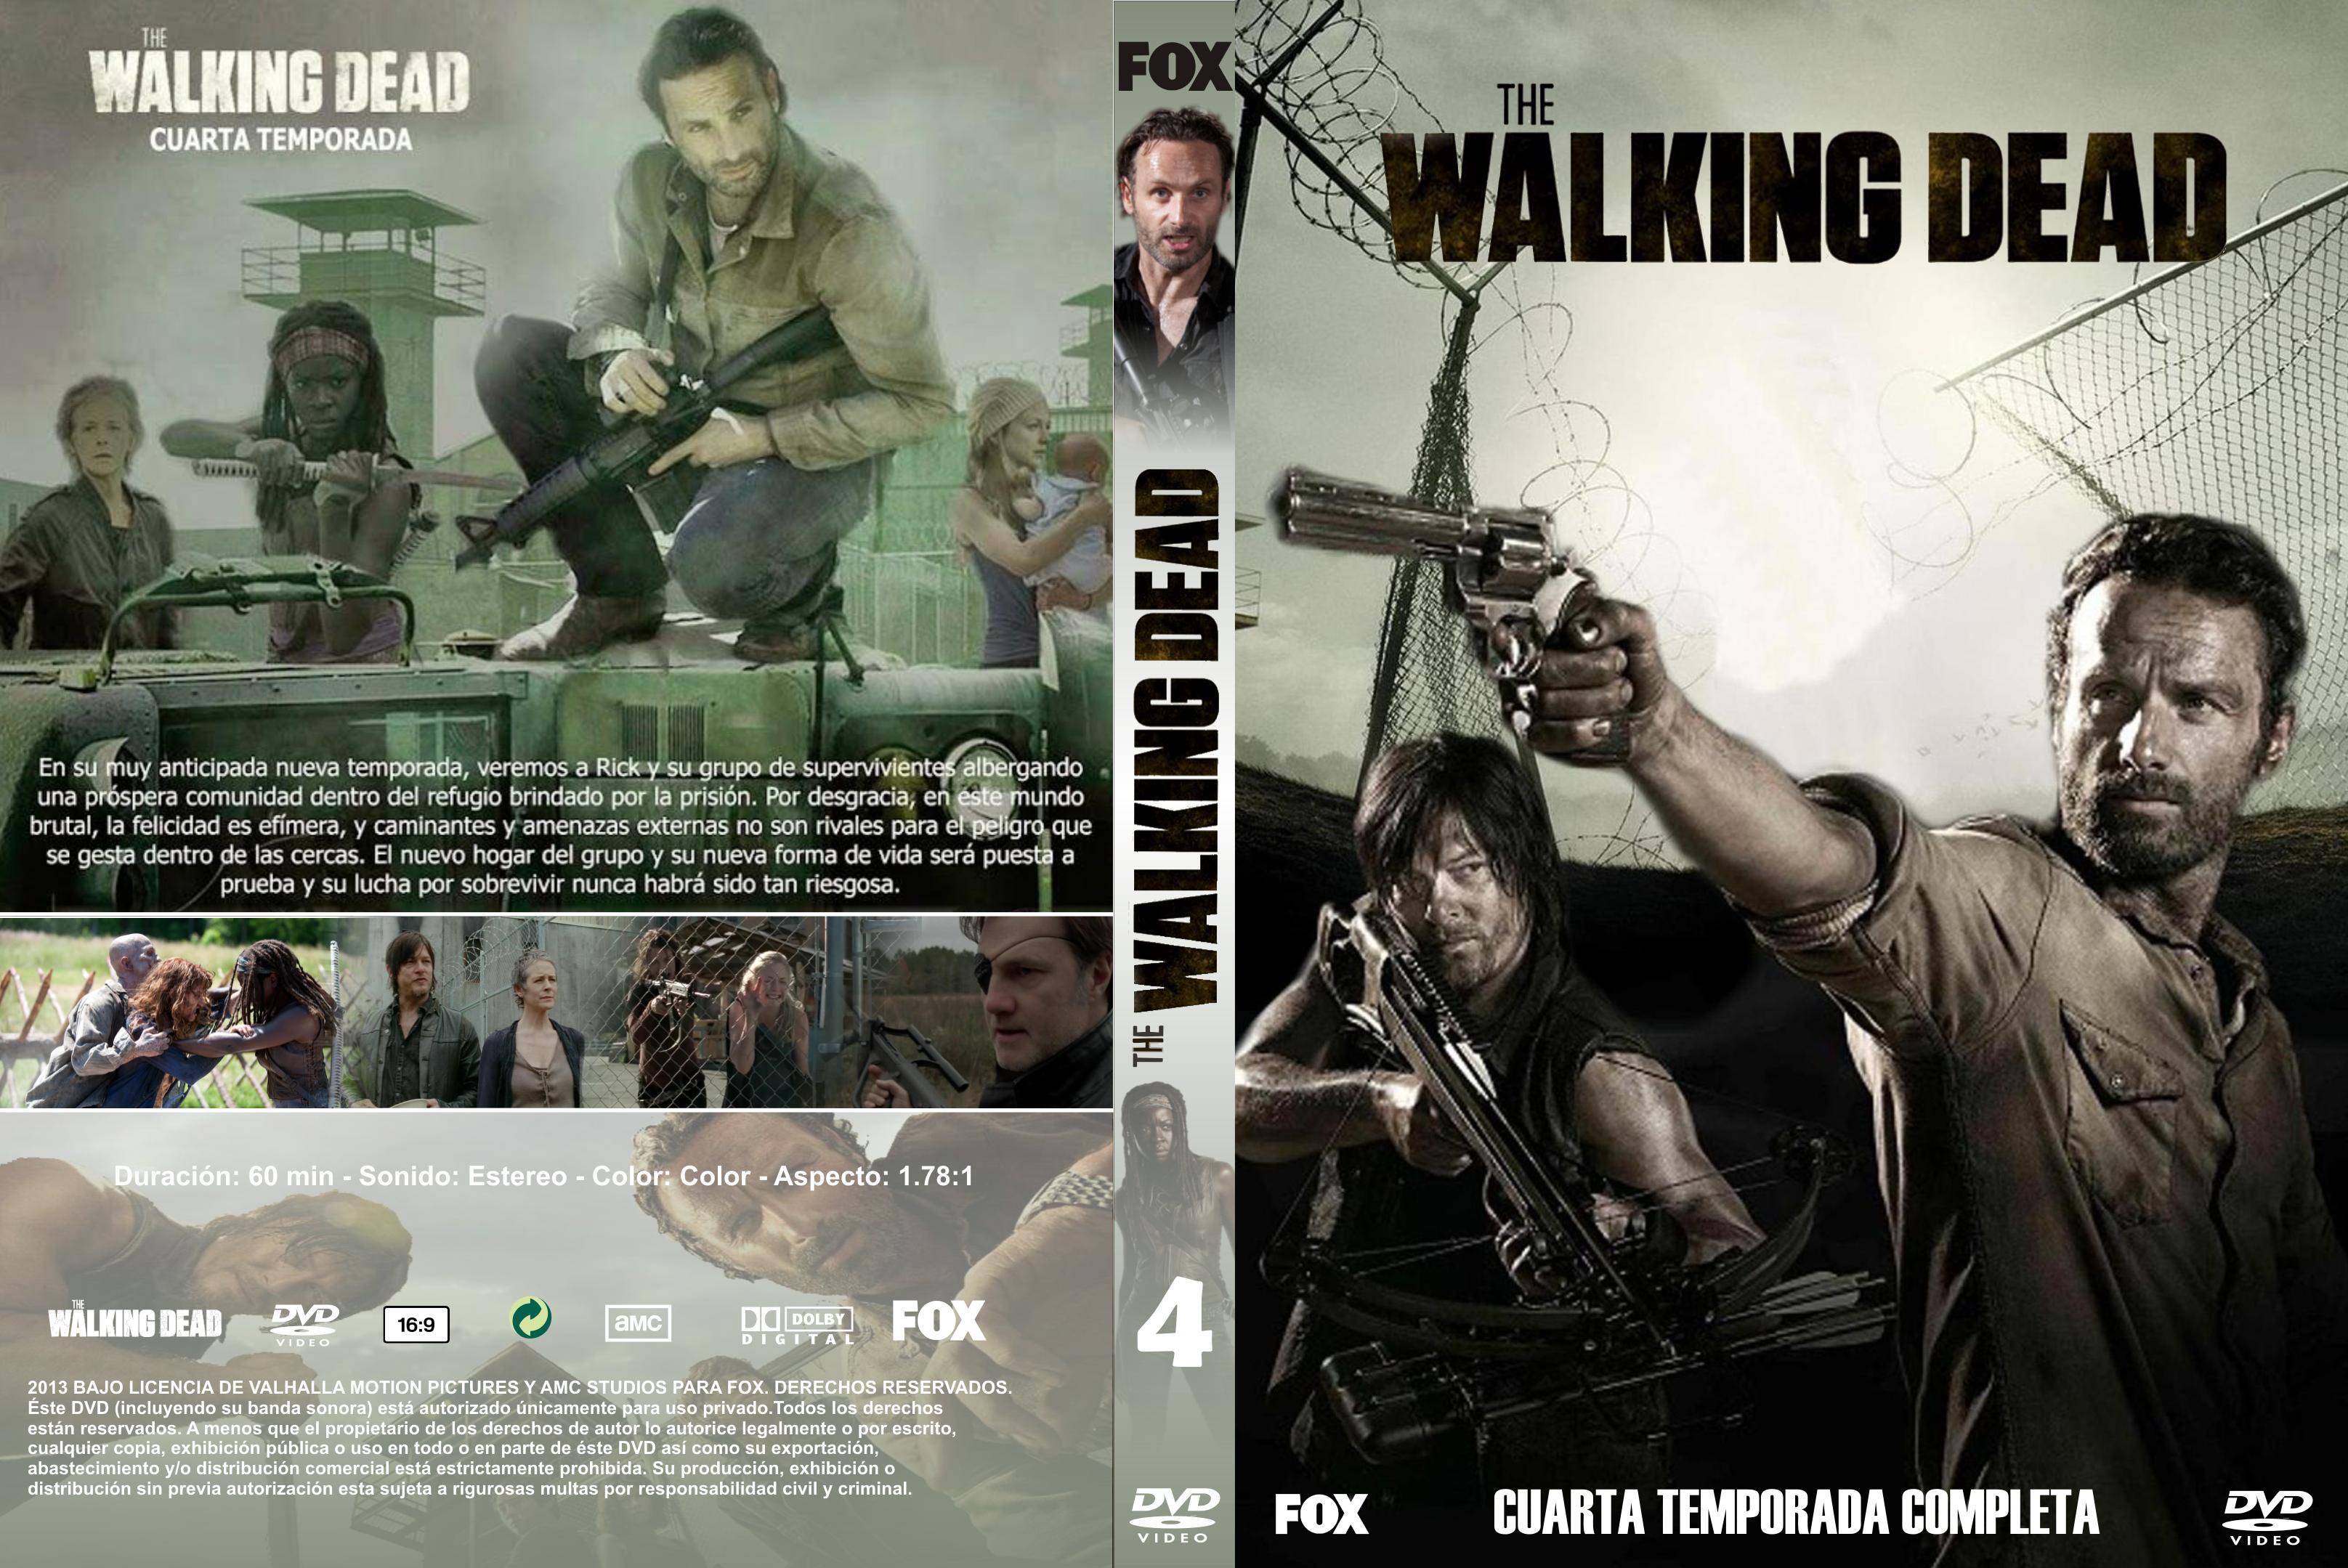 Pictures of The Walking Dead - www.kidskunst.info